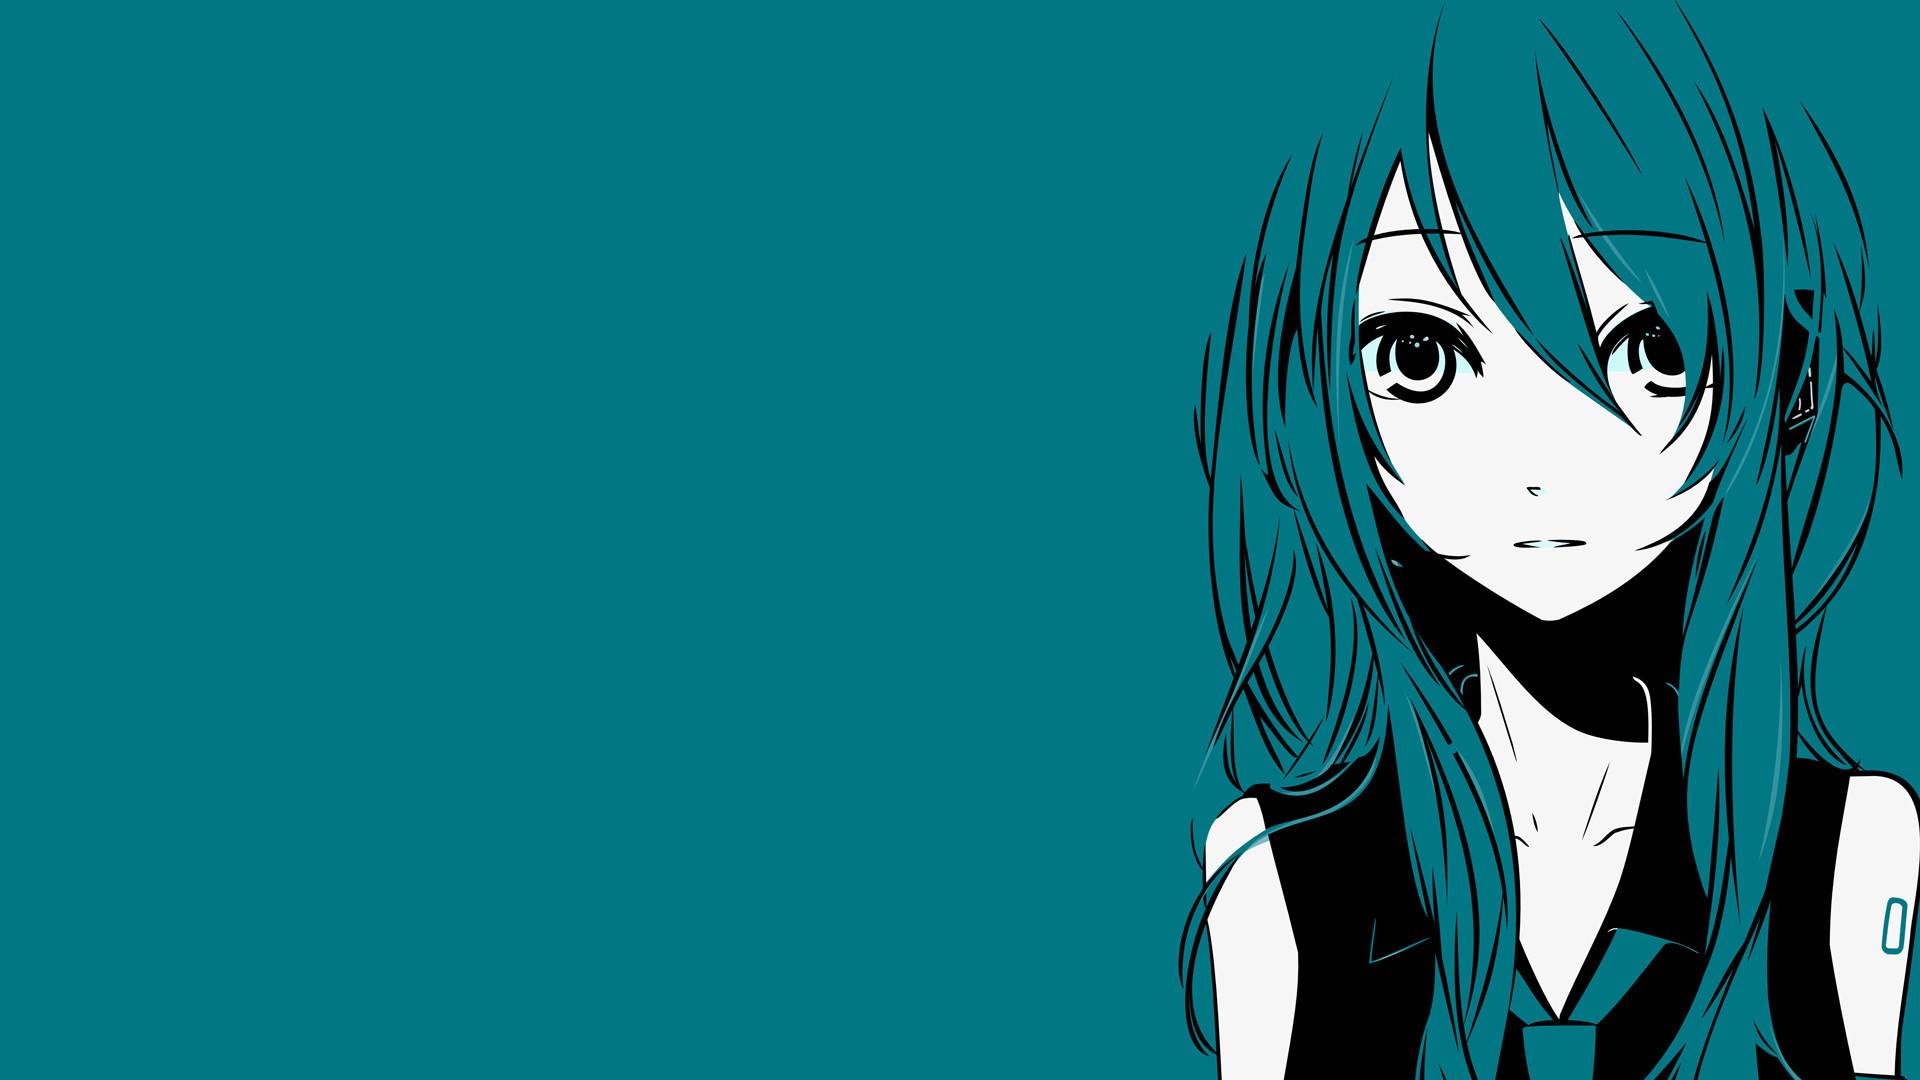 The 25+ best Hd anime wallpapers ideas on Pinterest | Anime wallpaper  download, Blue galaxy wallpaper and Hd galaxy wallpaper